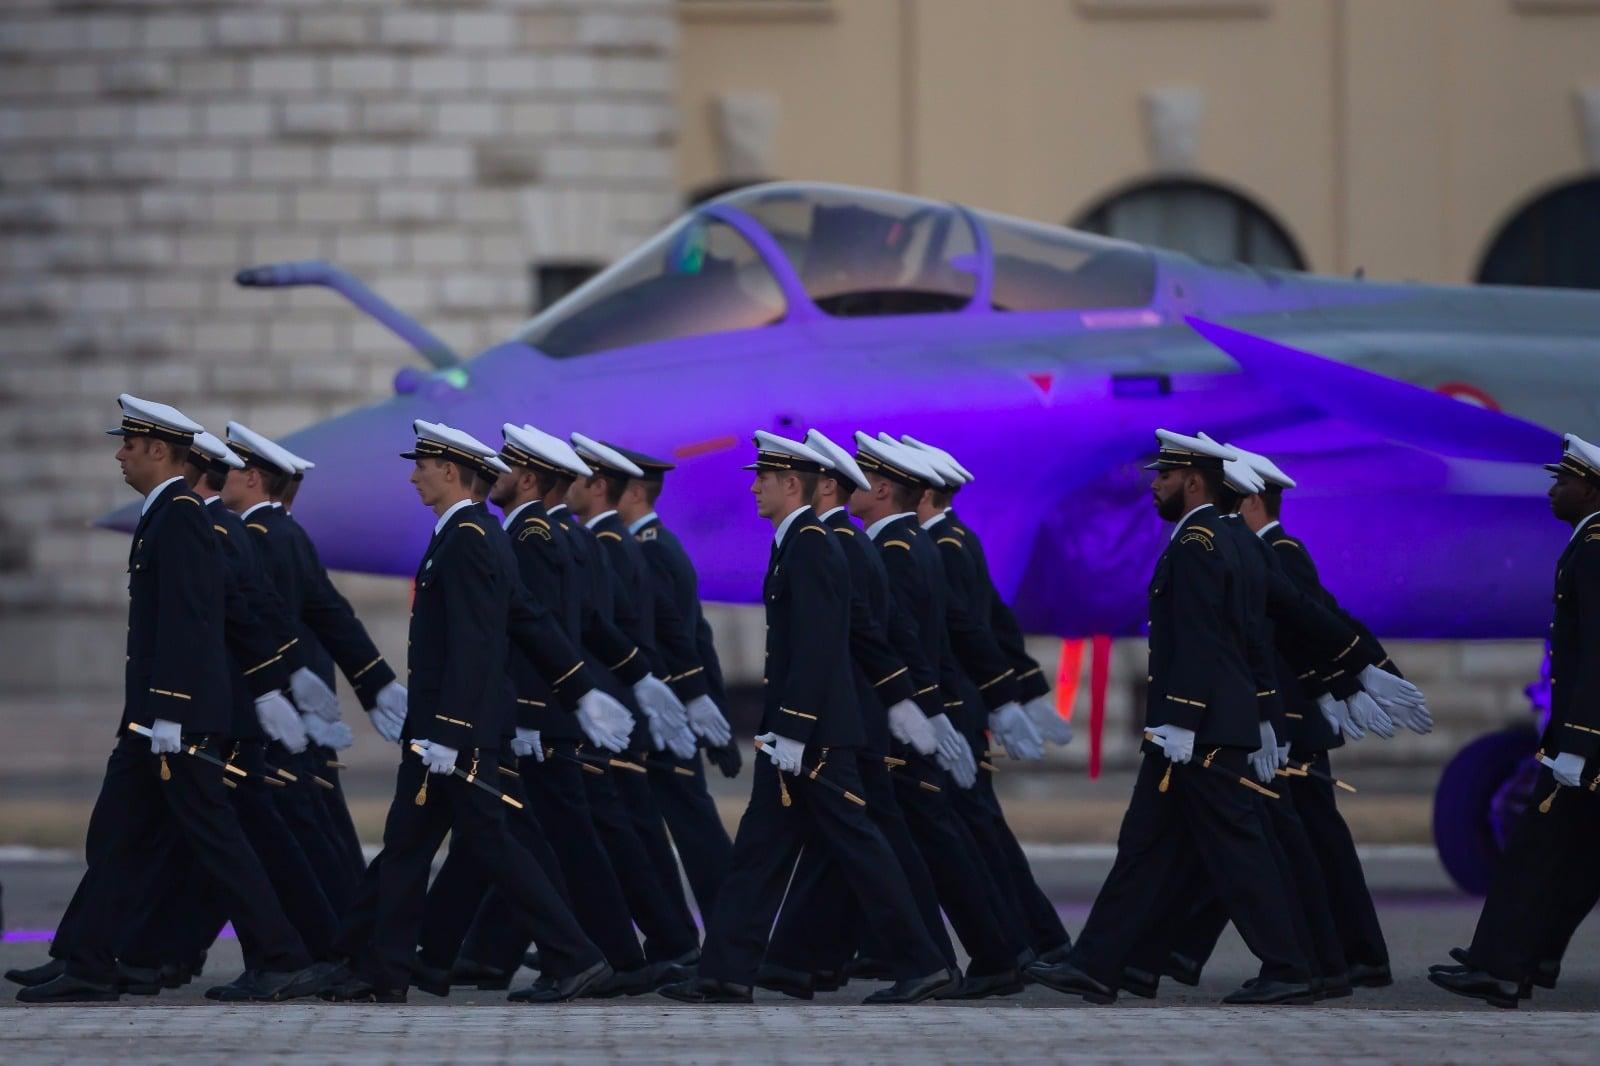 2016 dassault aviation spotlight for Base 701 salon de provence